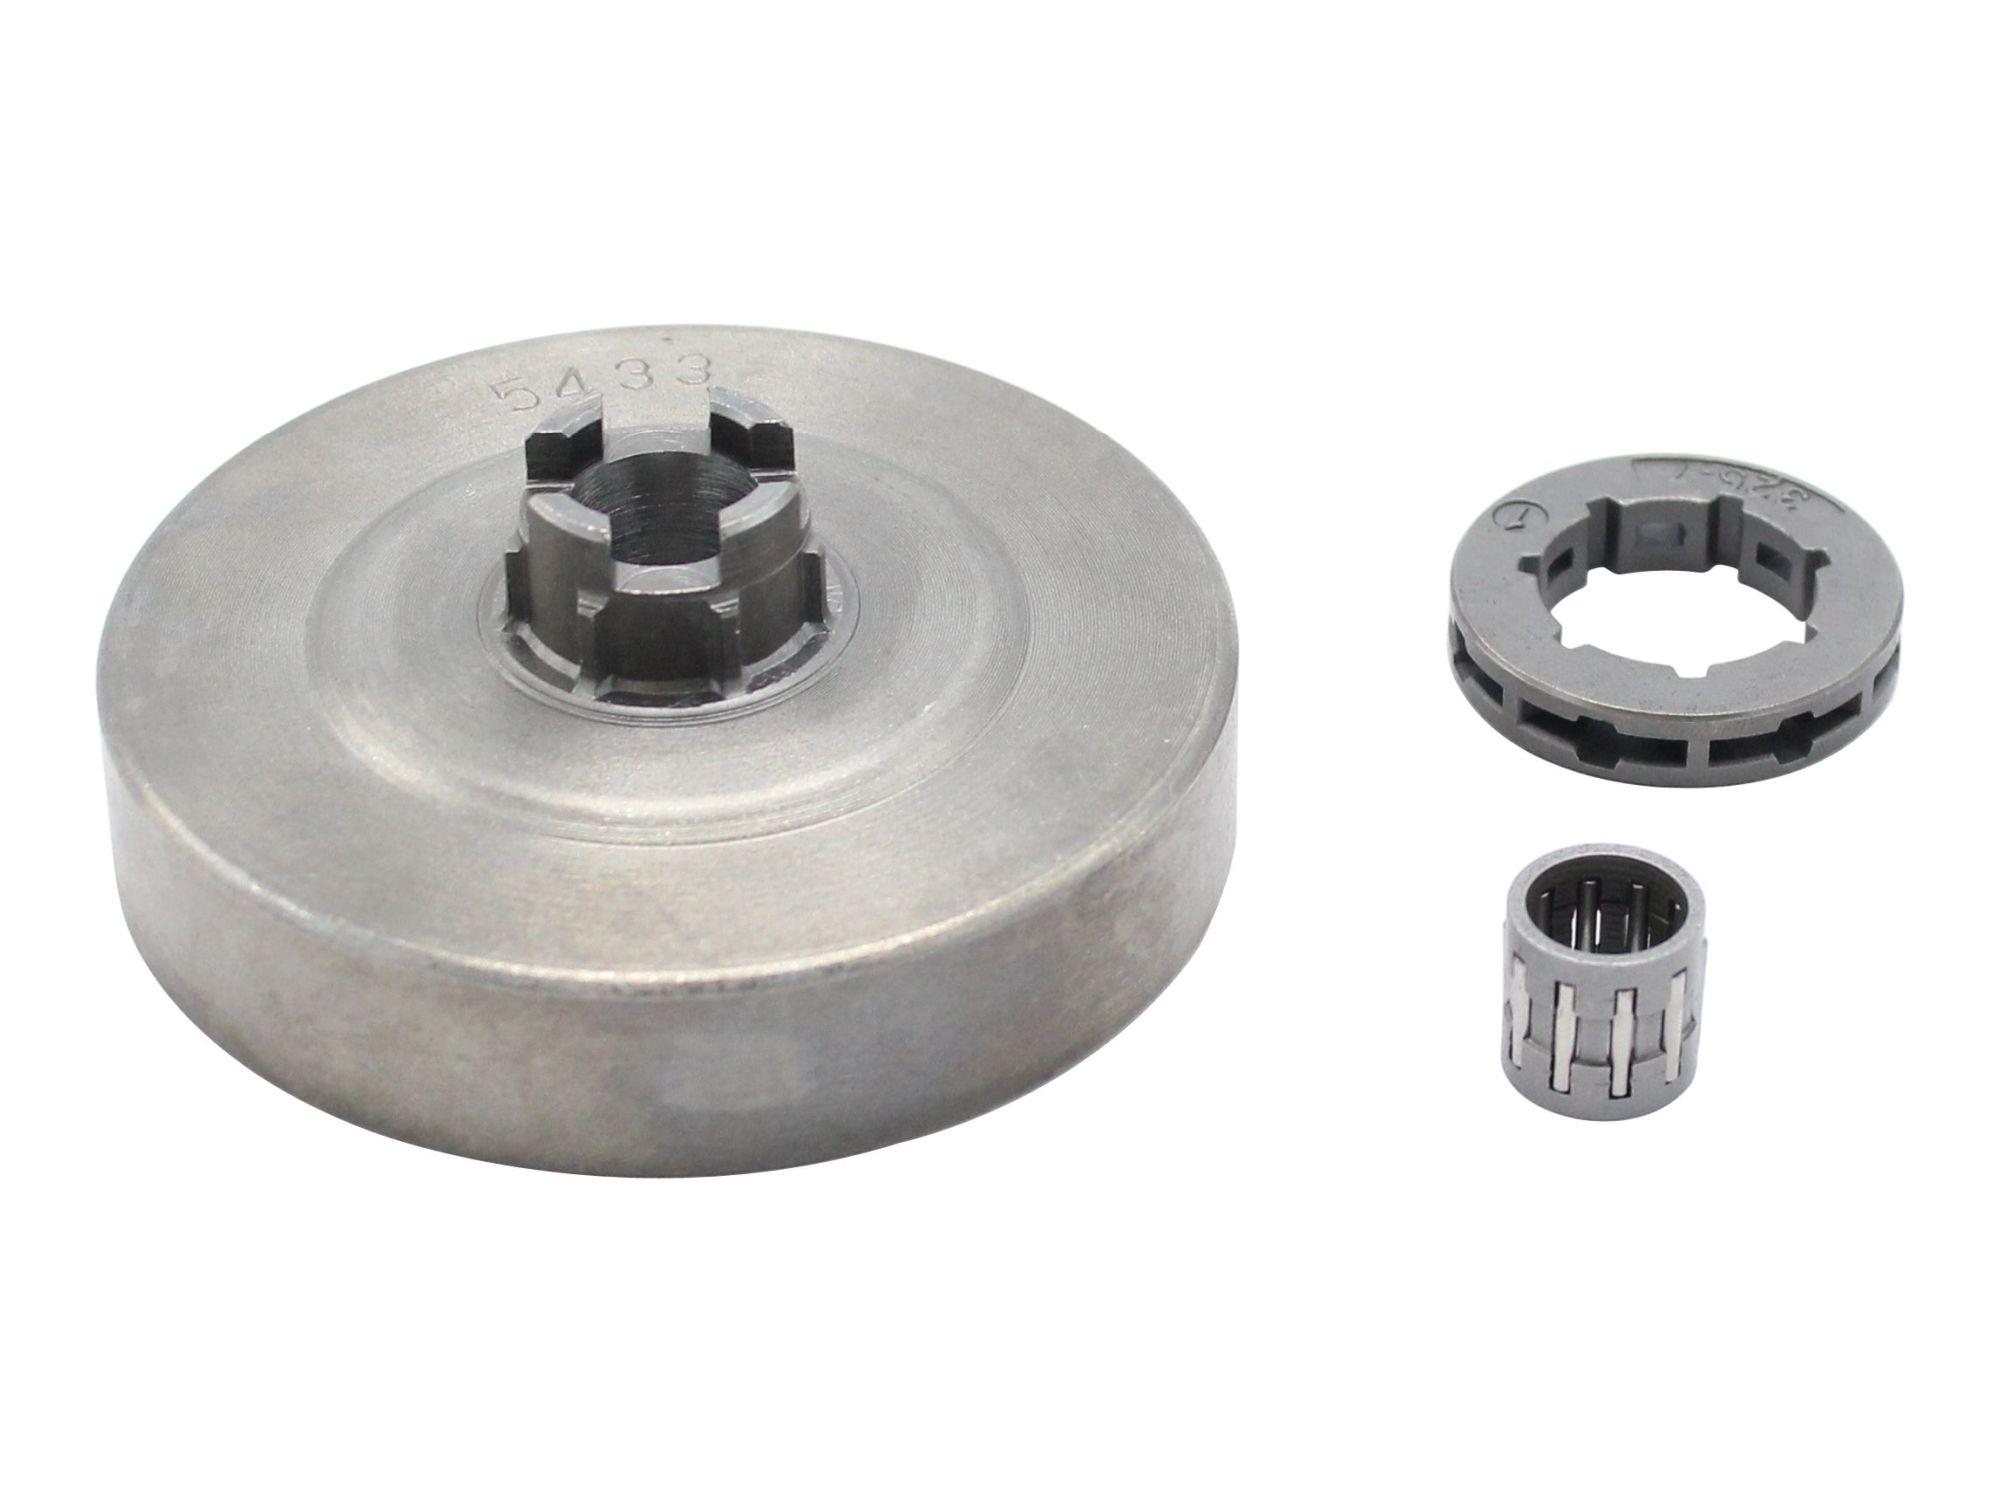 Nadellager für Kettenrad passend Viron PF-5200 Motorsäge